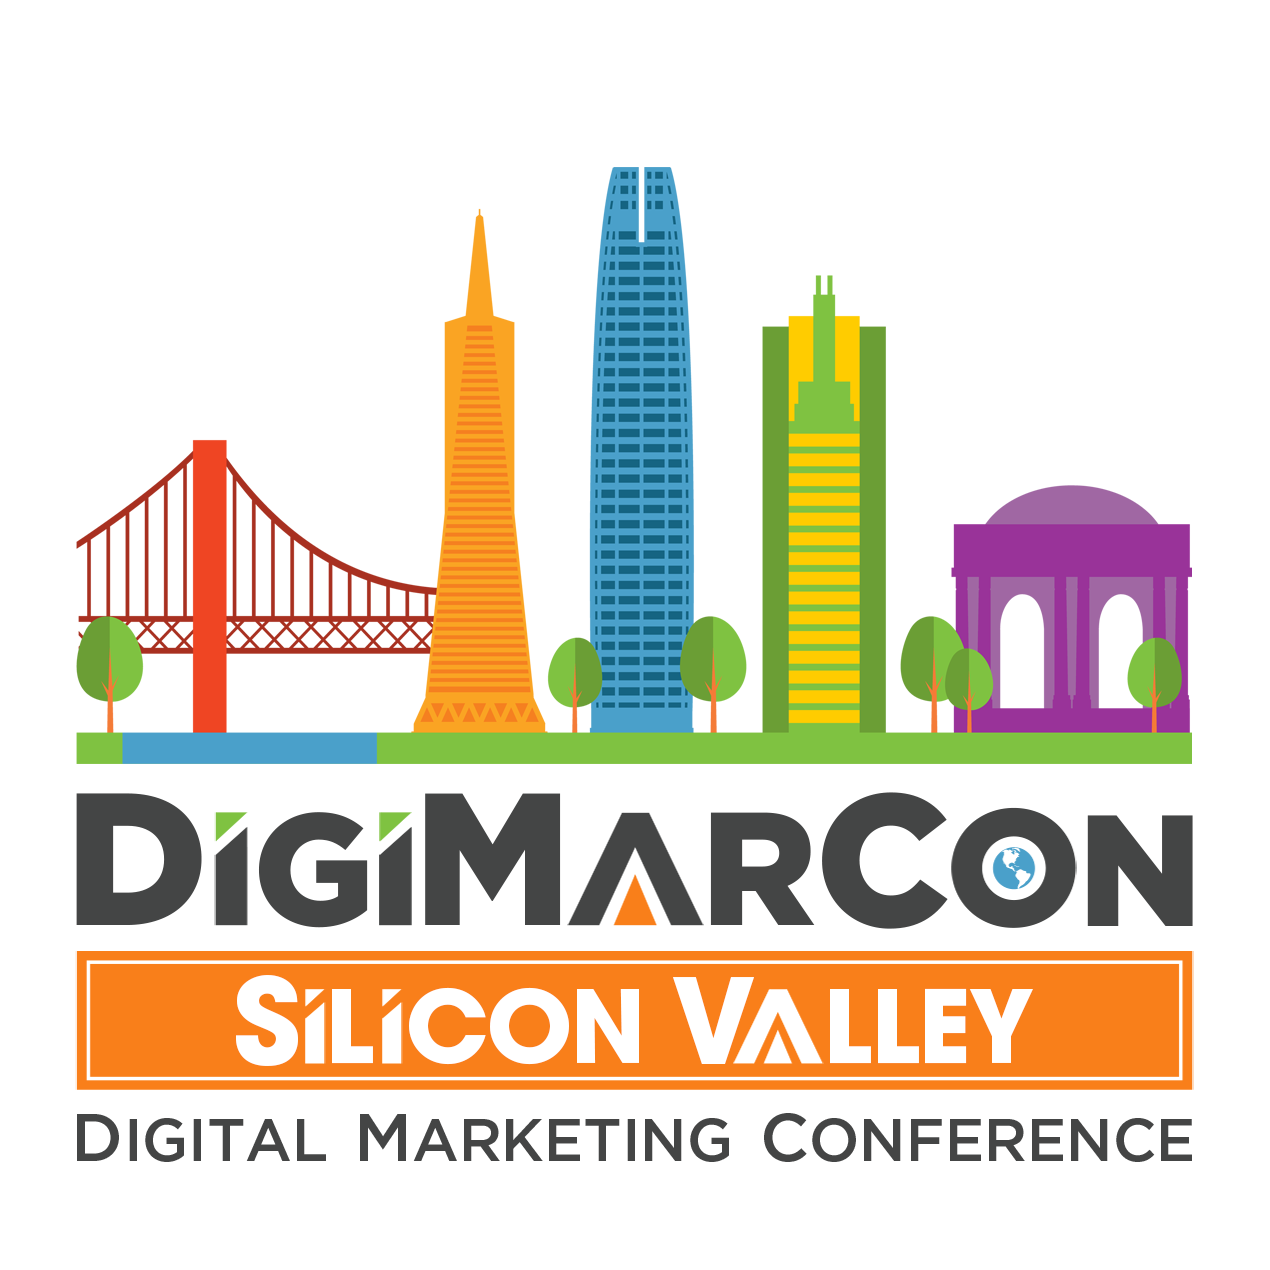 DigiMarCon Silicon Valley 2022 – Digital Marketing, Media and Advertising Conference & Exhibition